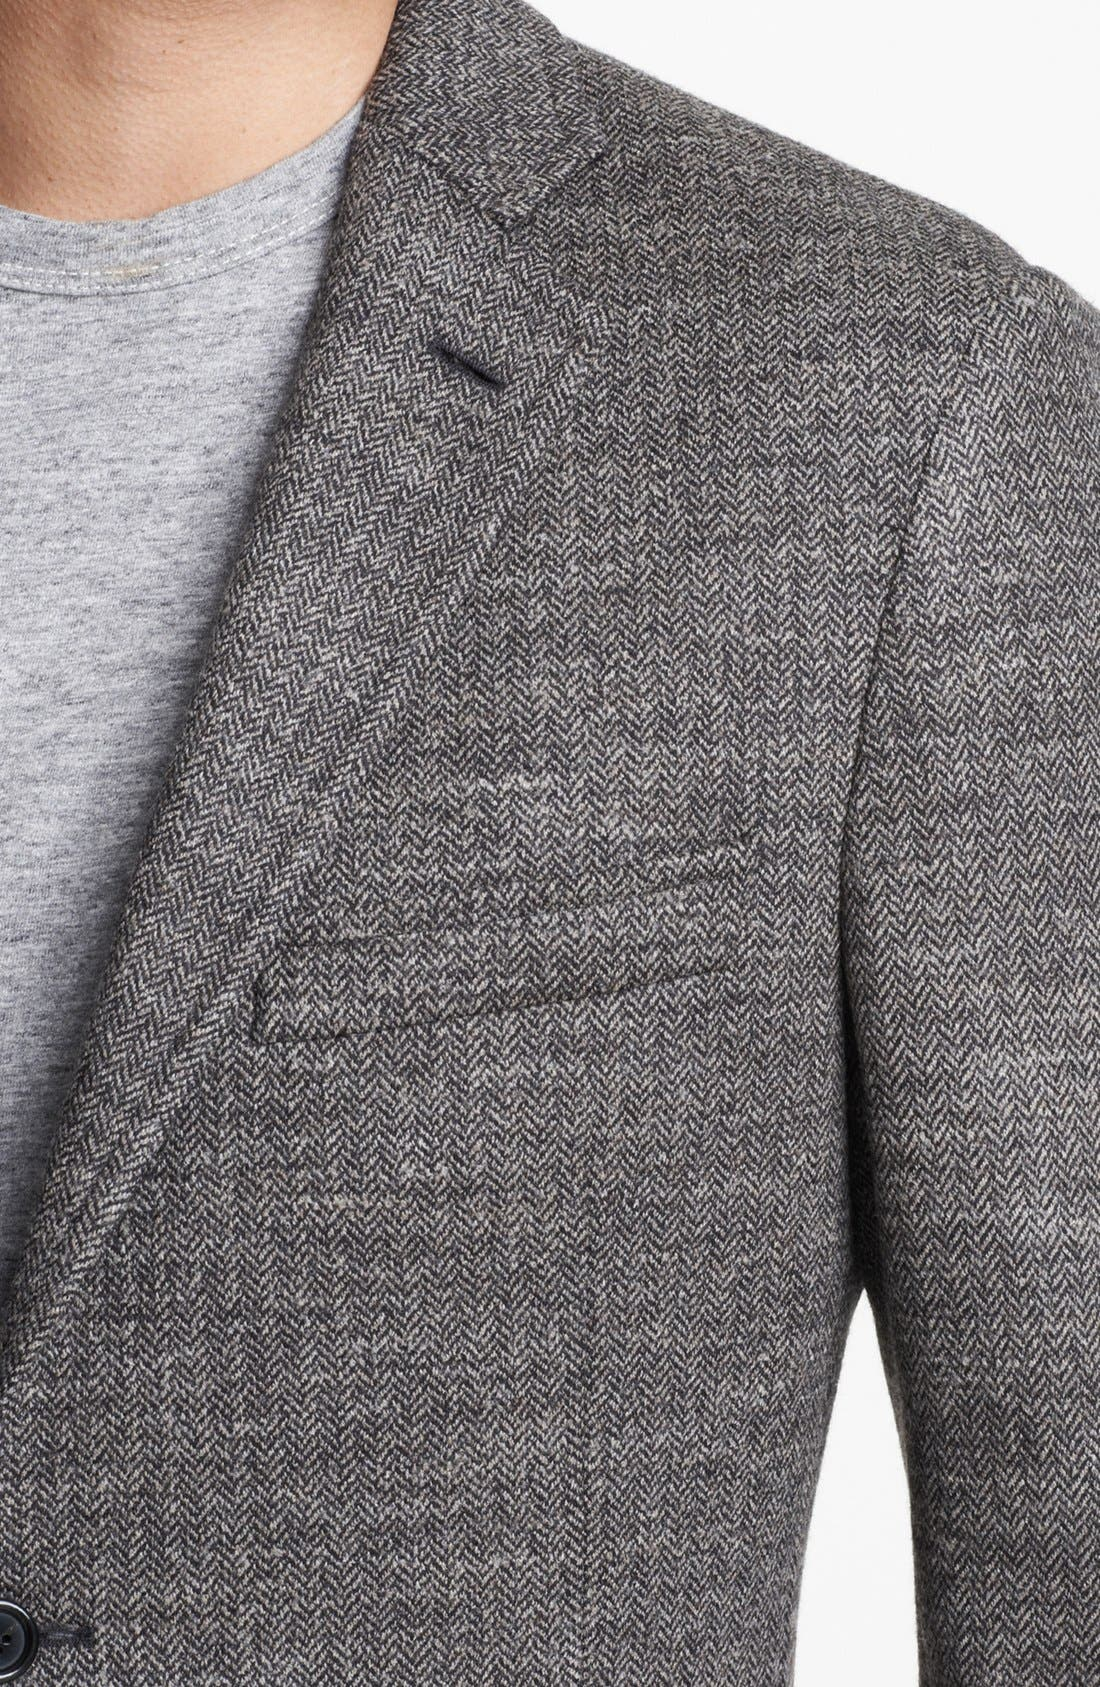 Alternate Image 2  - Todd Snyder Grey Wool Herringbone Blazer